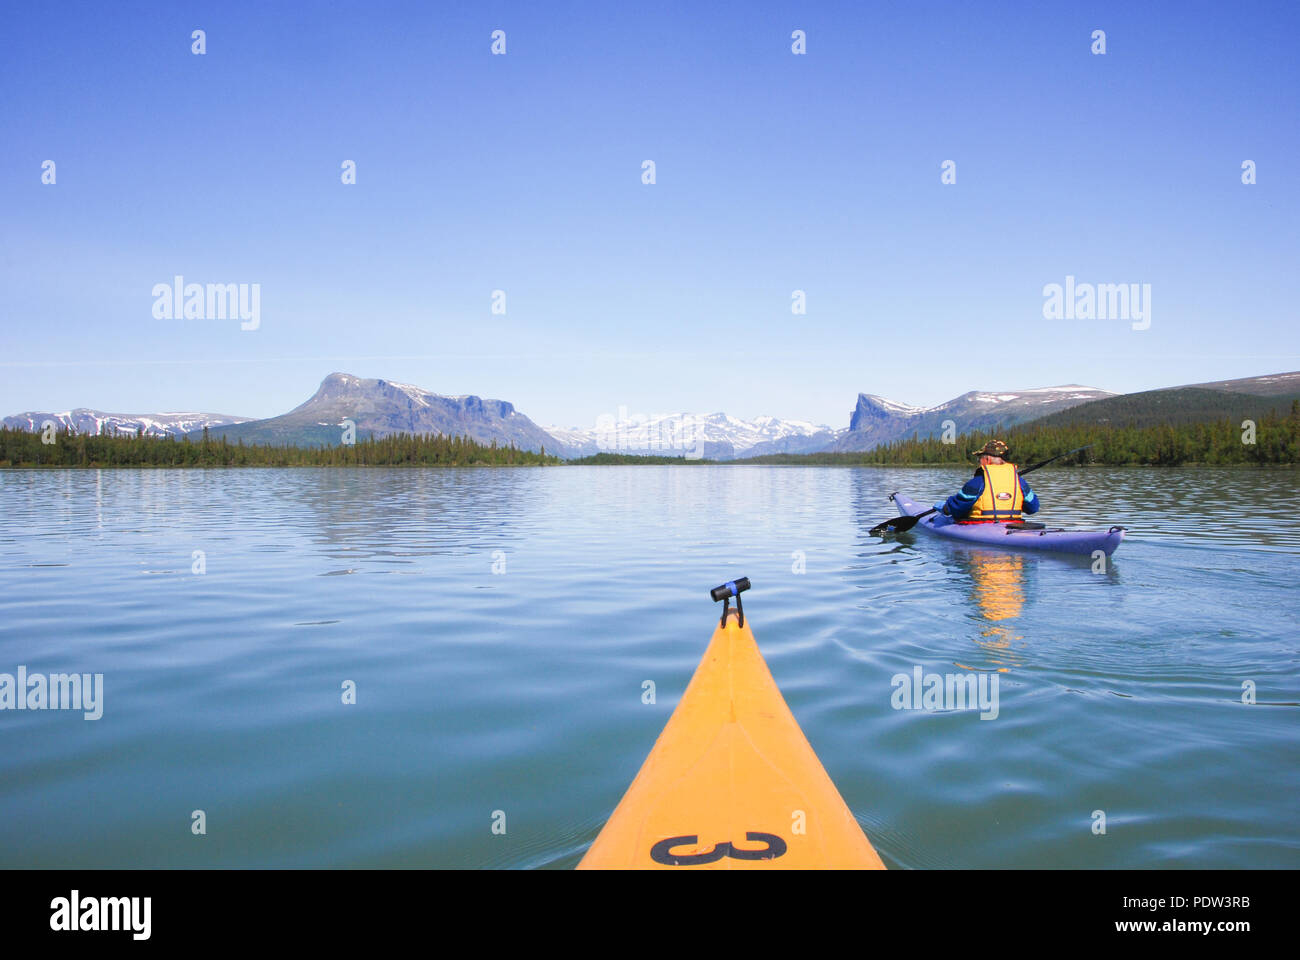 The beauty of Laponia Wilderness - Kayaking Lake Laitaure - Stock Image